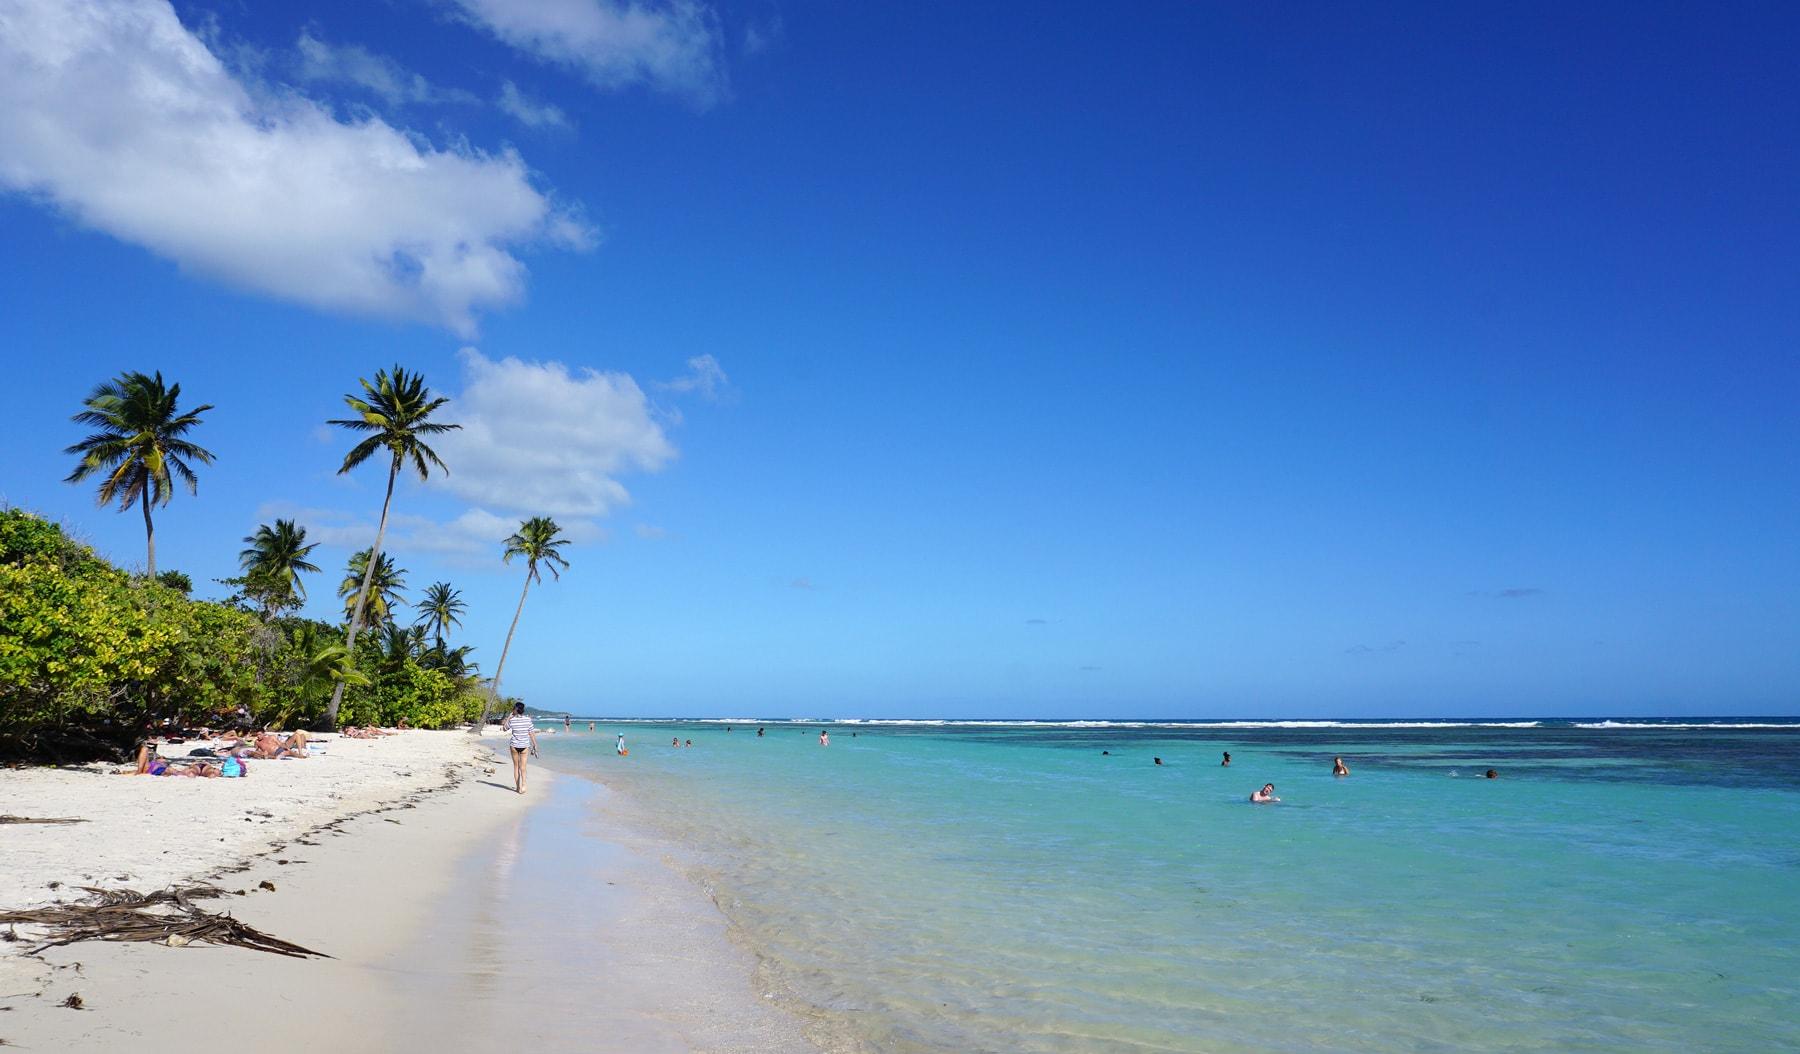 Voyage en famille en Guadeloupe : la plage de bois Jolan